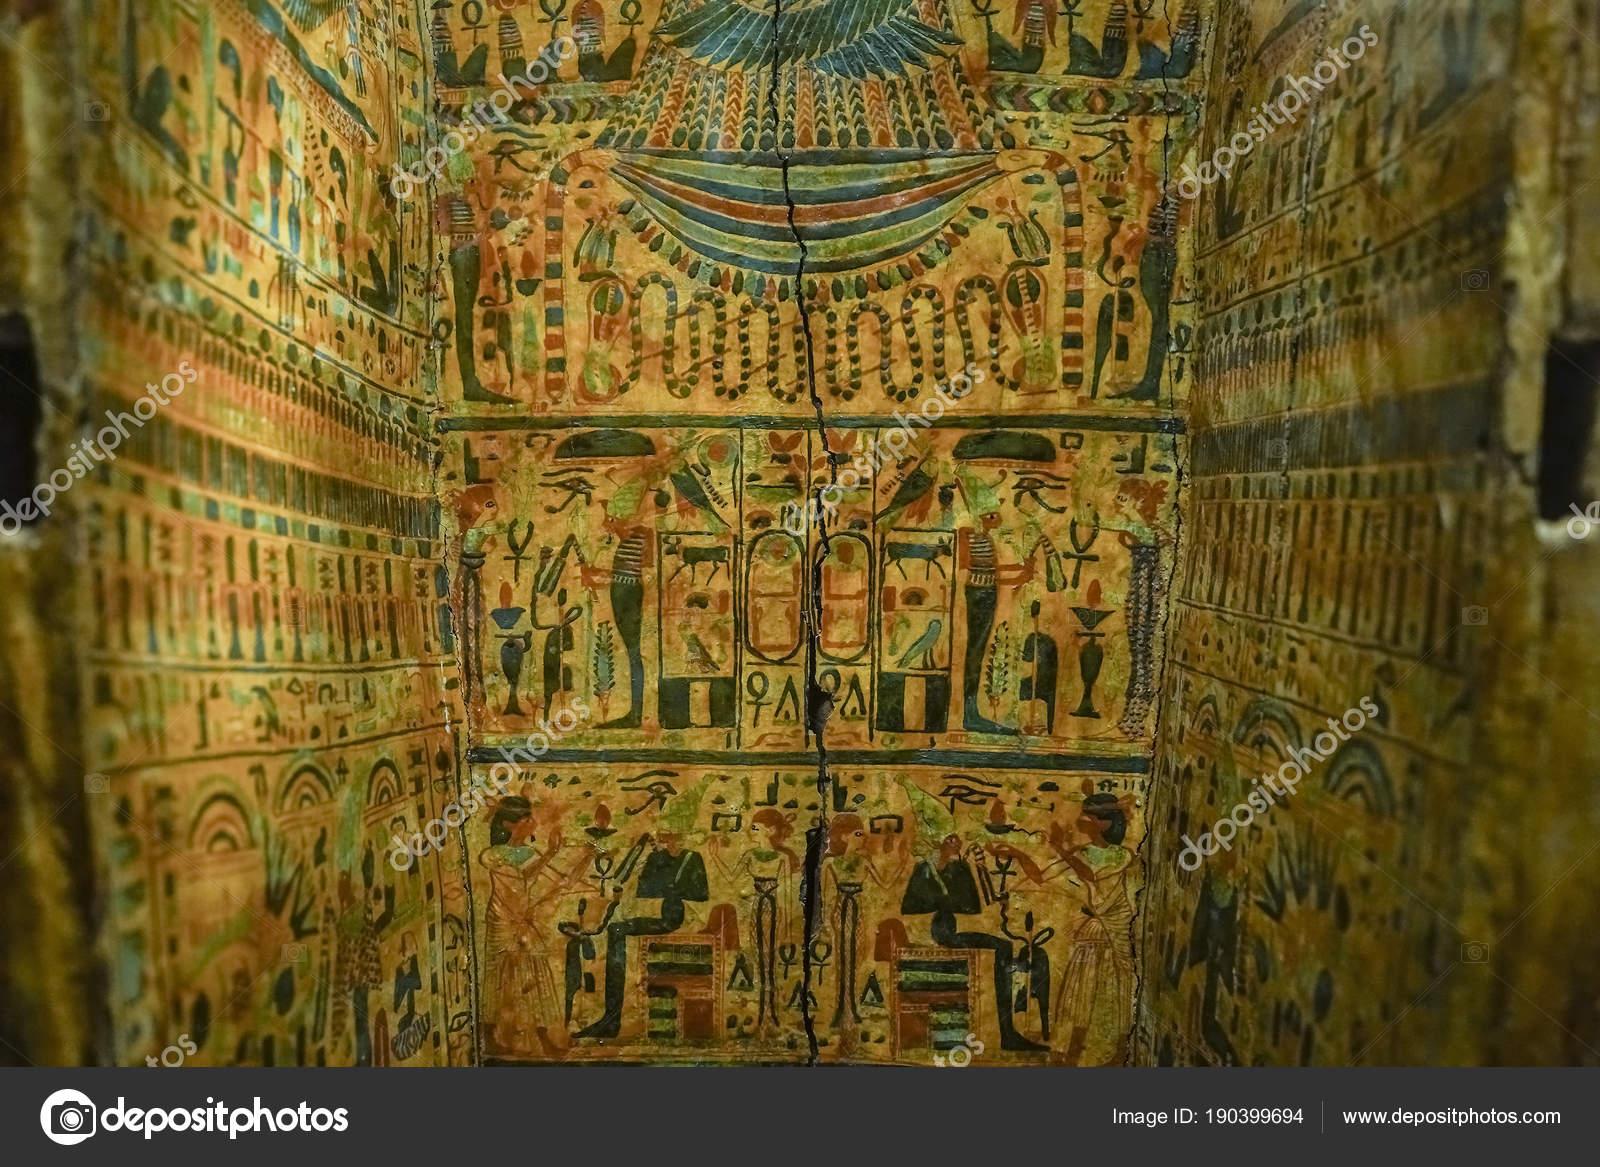 Sarcophagus Ancient Egyptian Hieroglyphs Carved Stone Wall Karnak ...